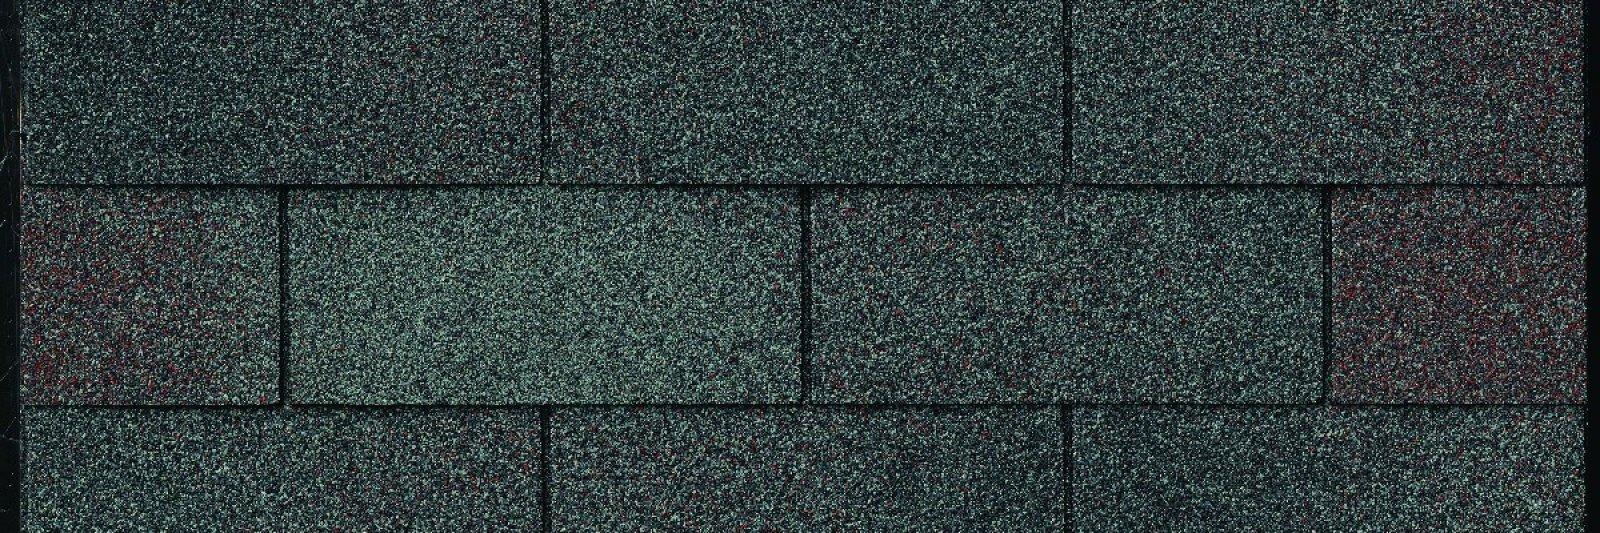 Slate Gray image